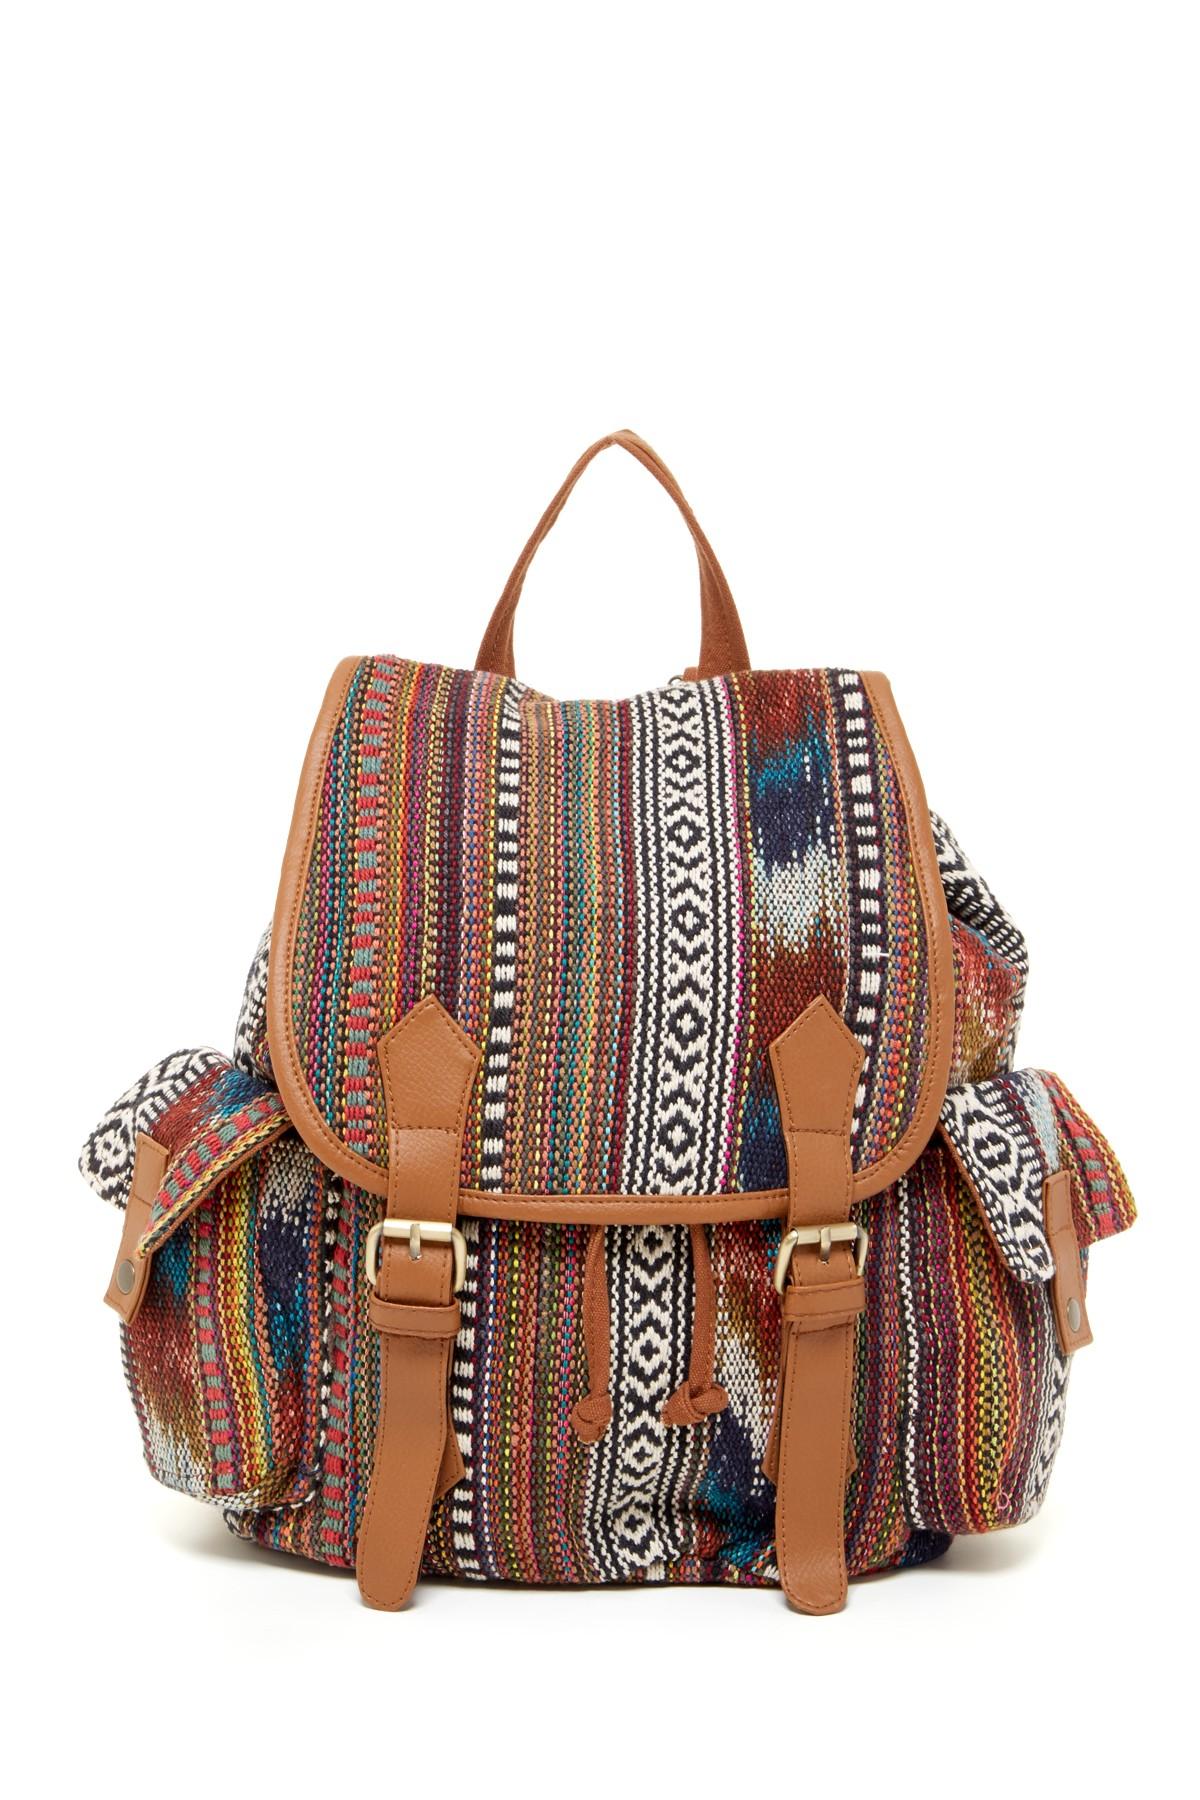 Barganza backpack